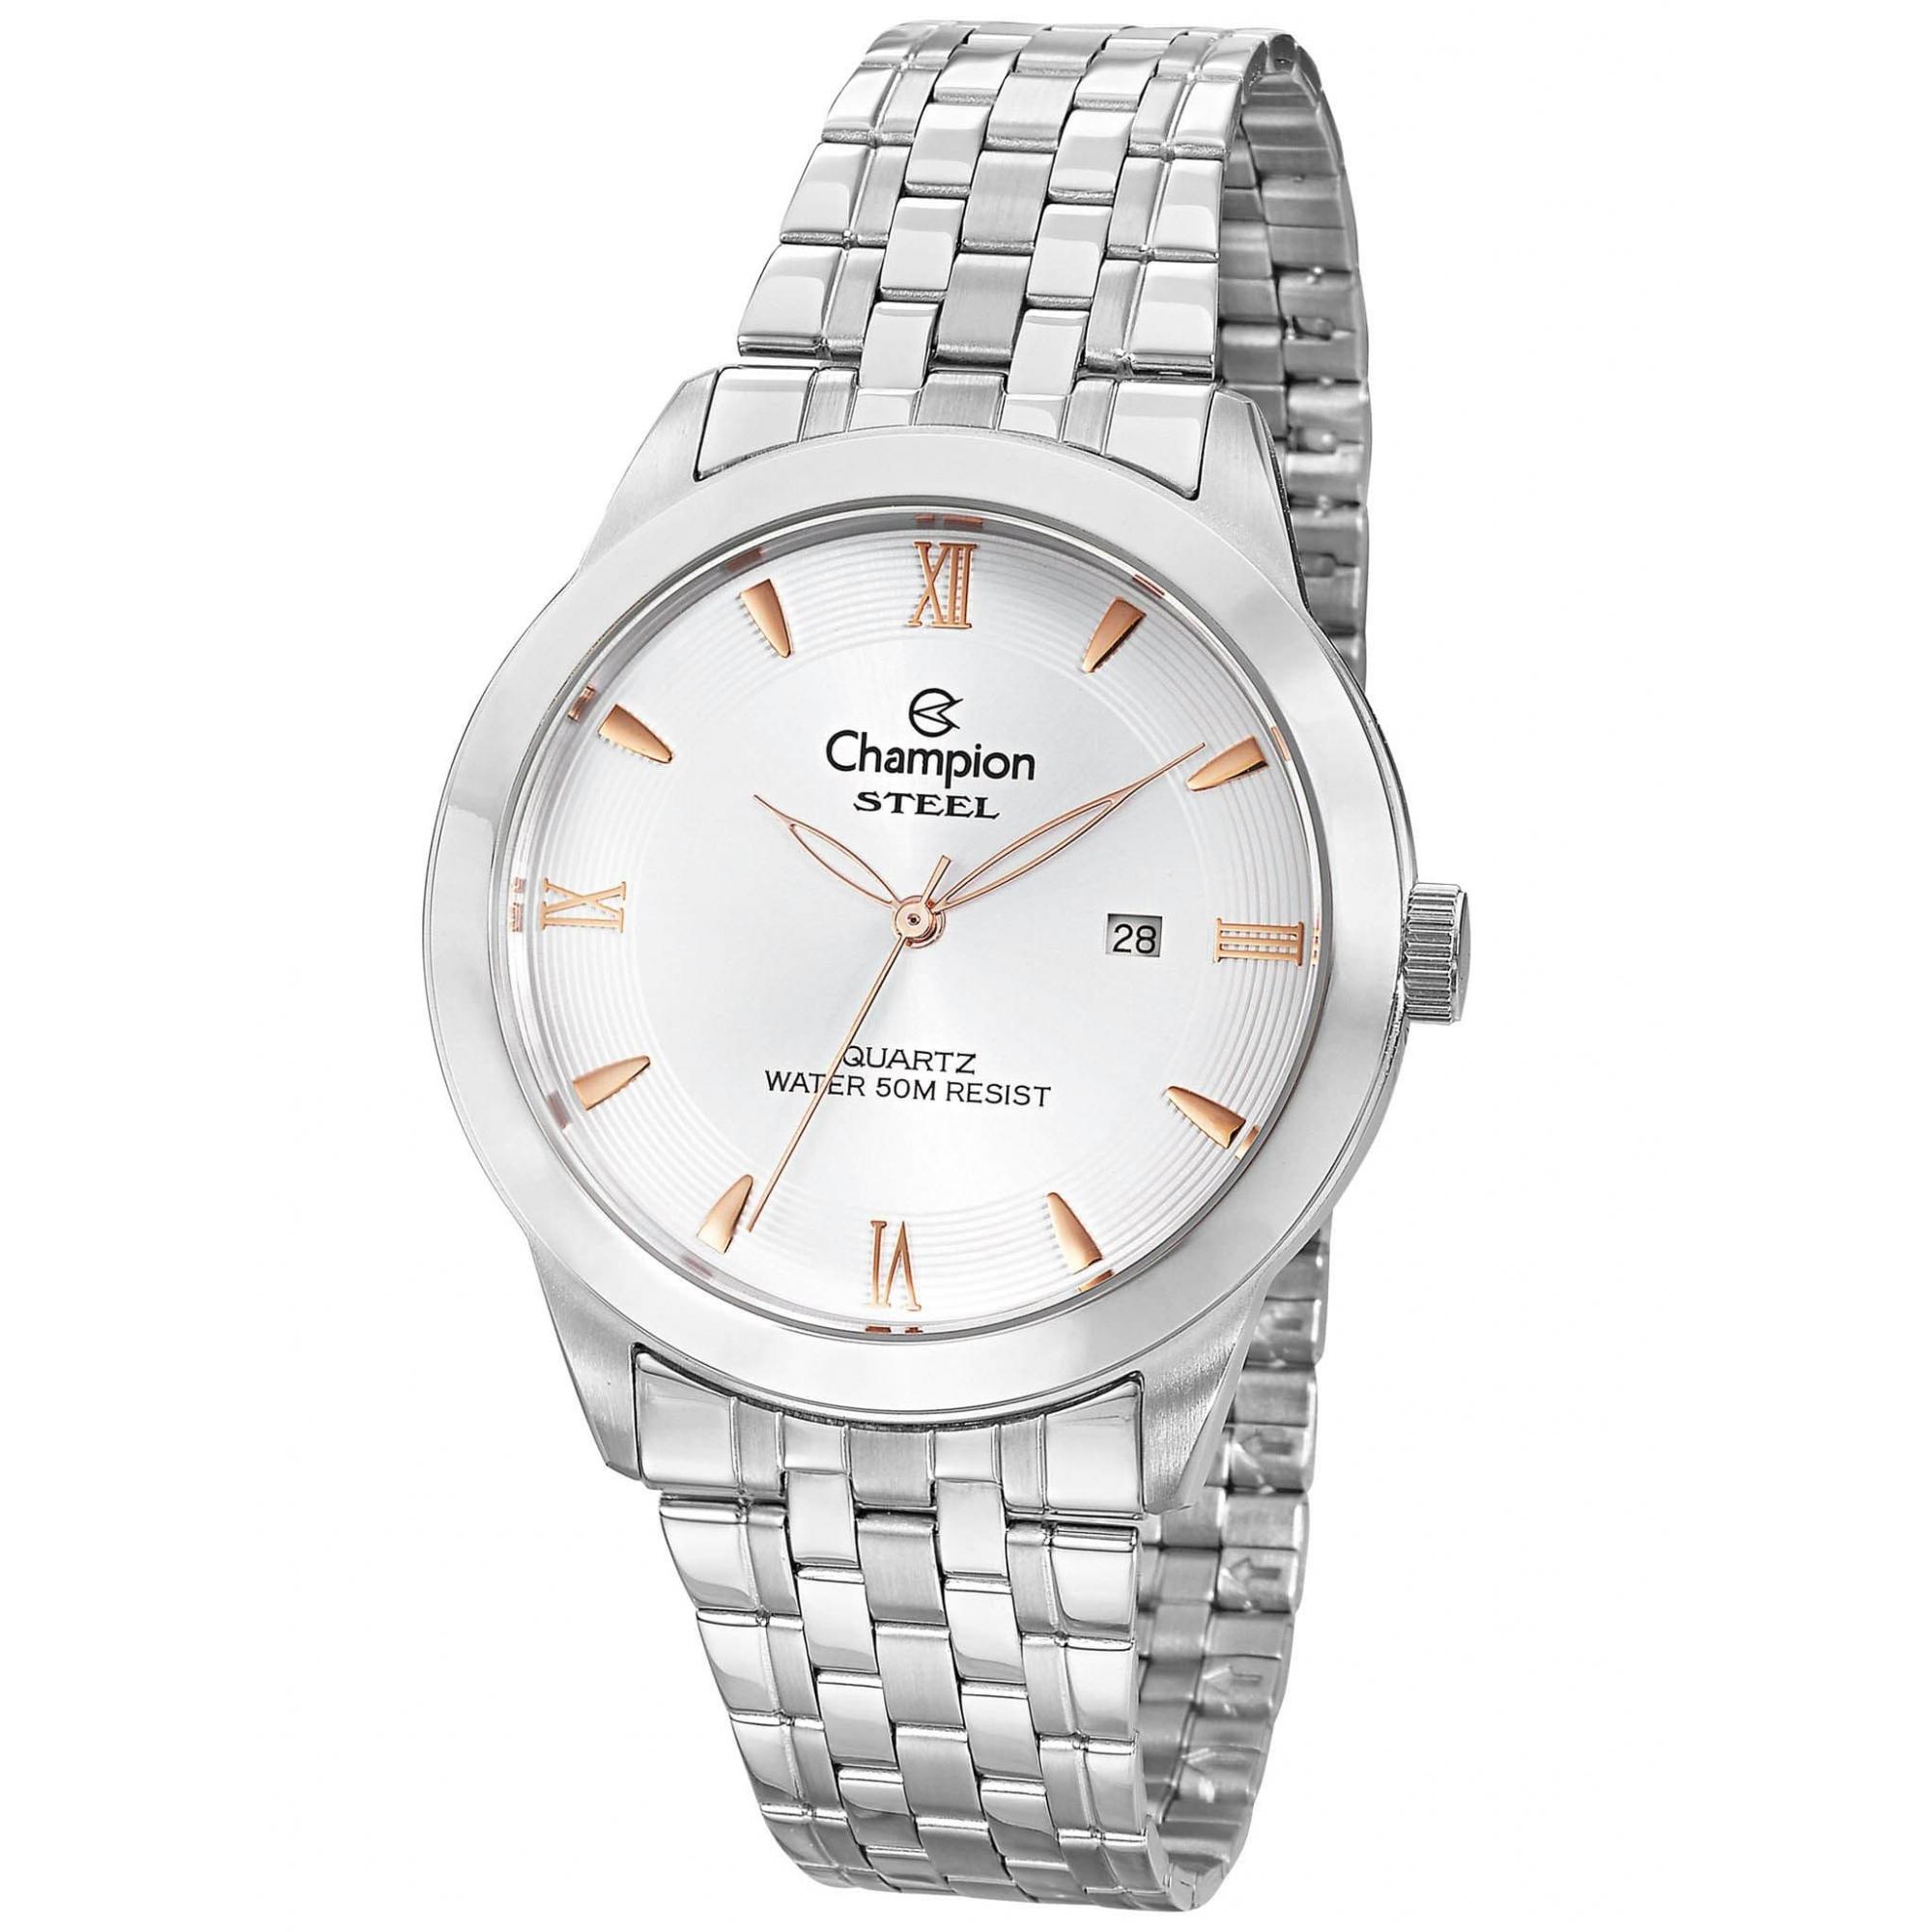 Relógio Champion Masculino Prateado - Stell - CA21599Q